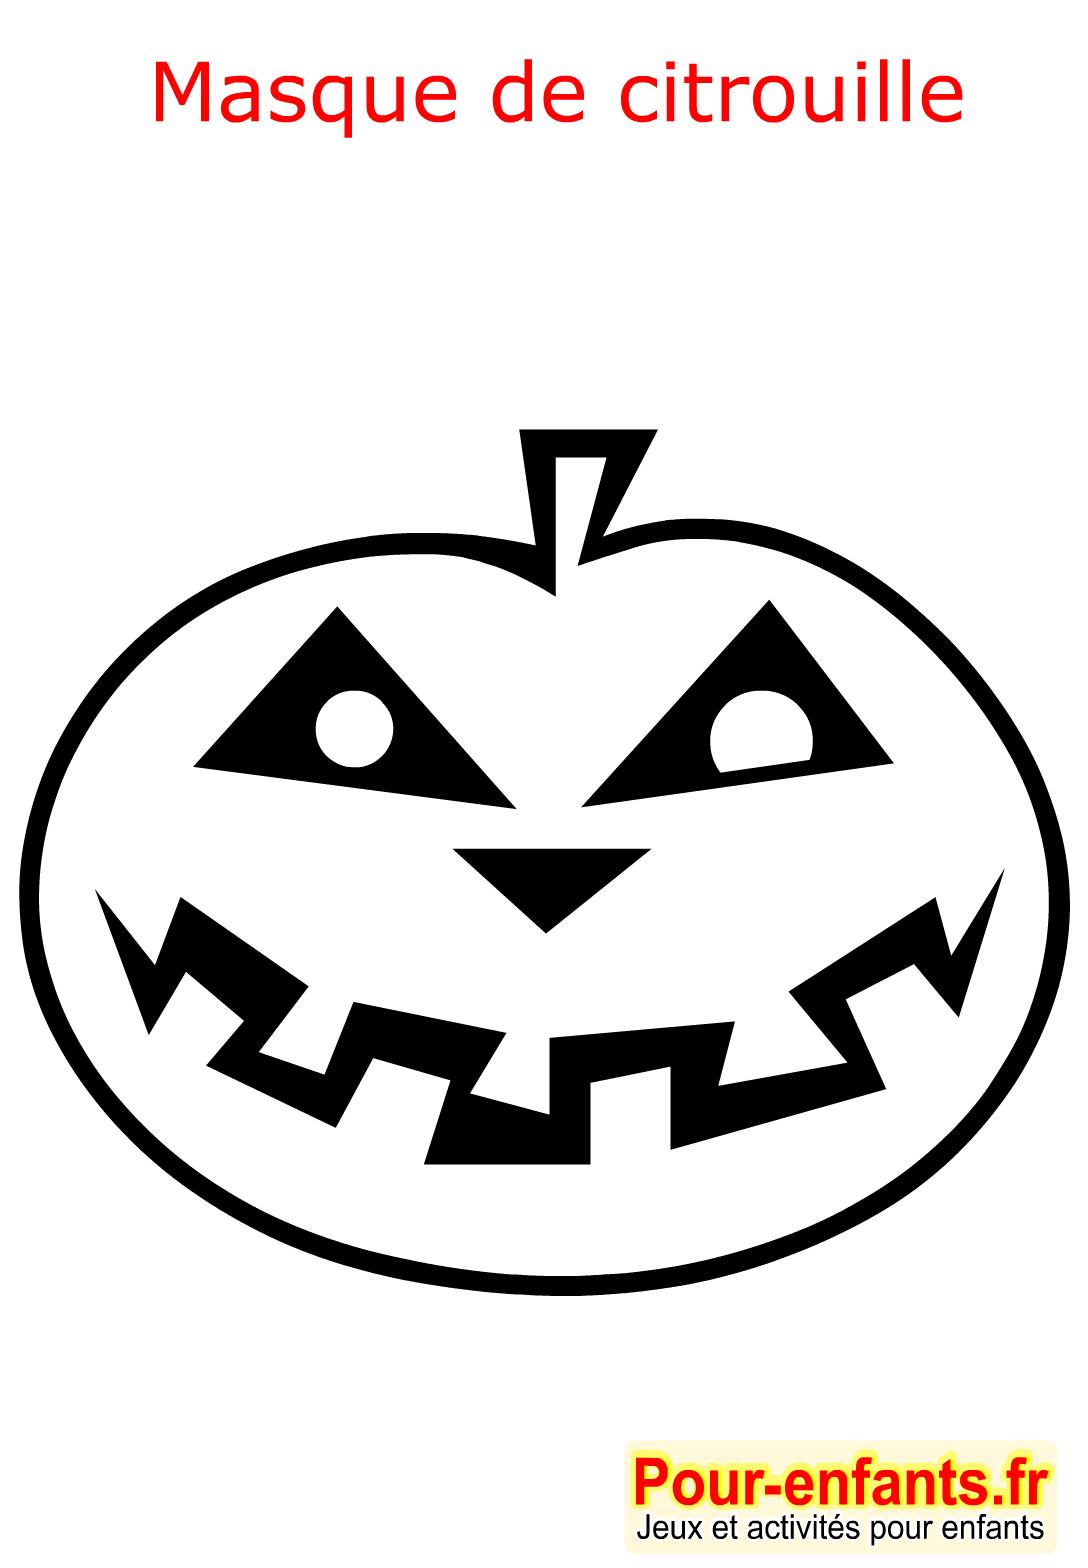 Pin halloween coloriage masque citrouille enfant fabrication masques de on pinterest - Masque halloween a fabriquer ...